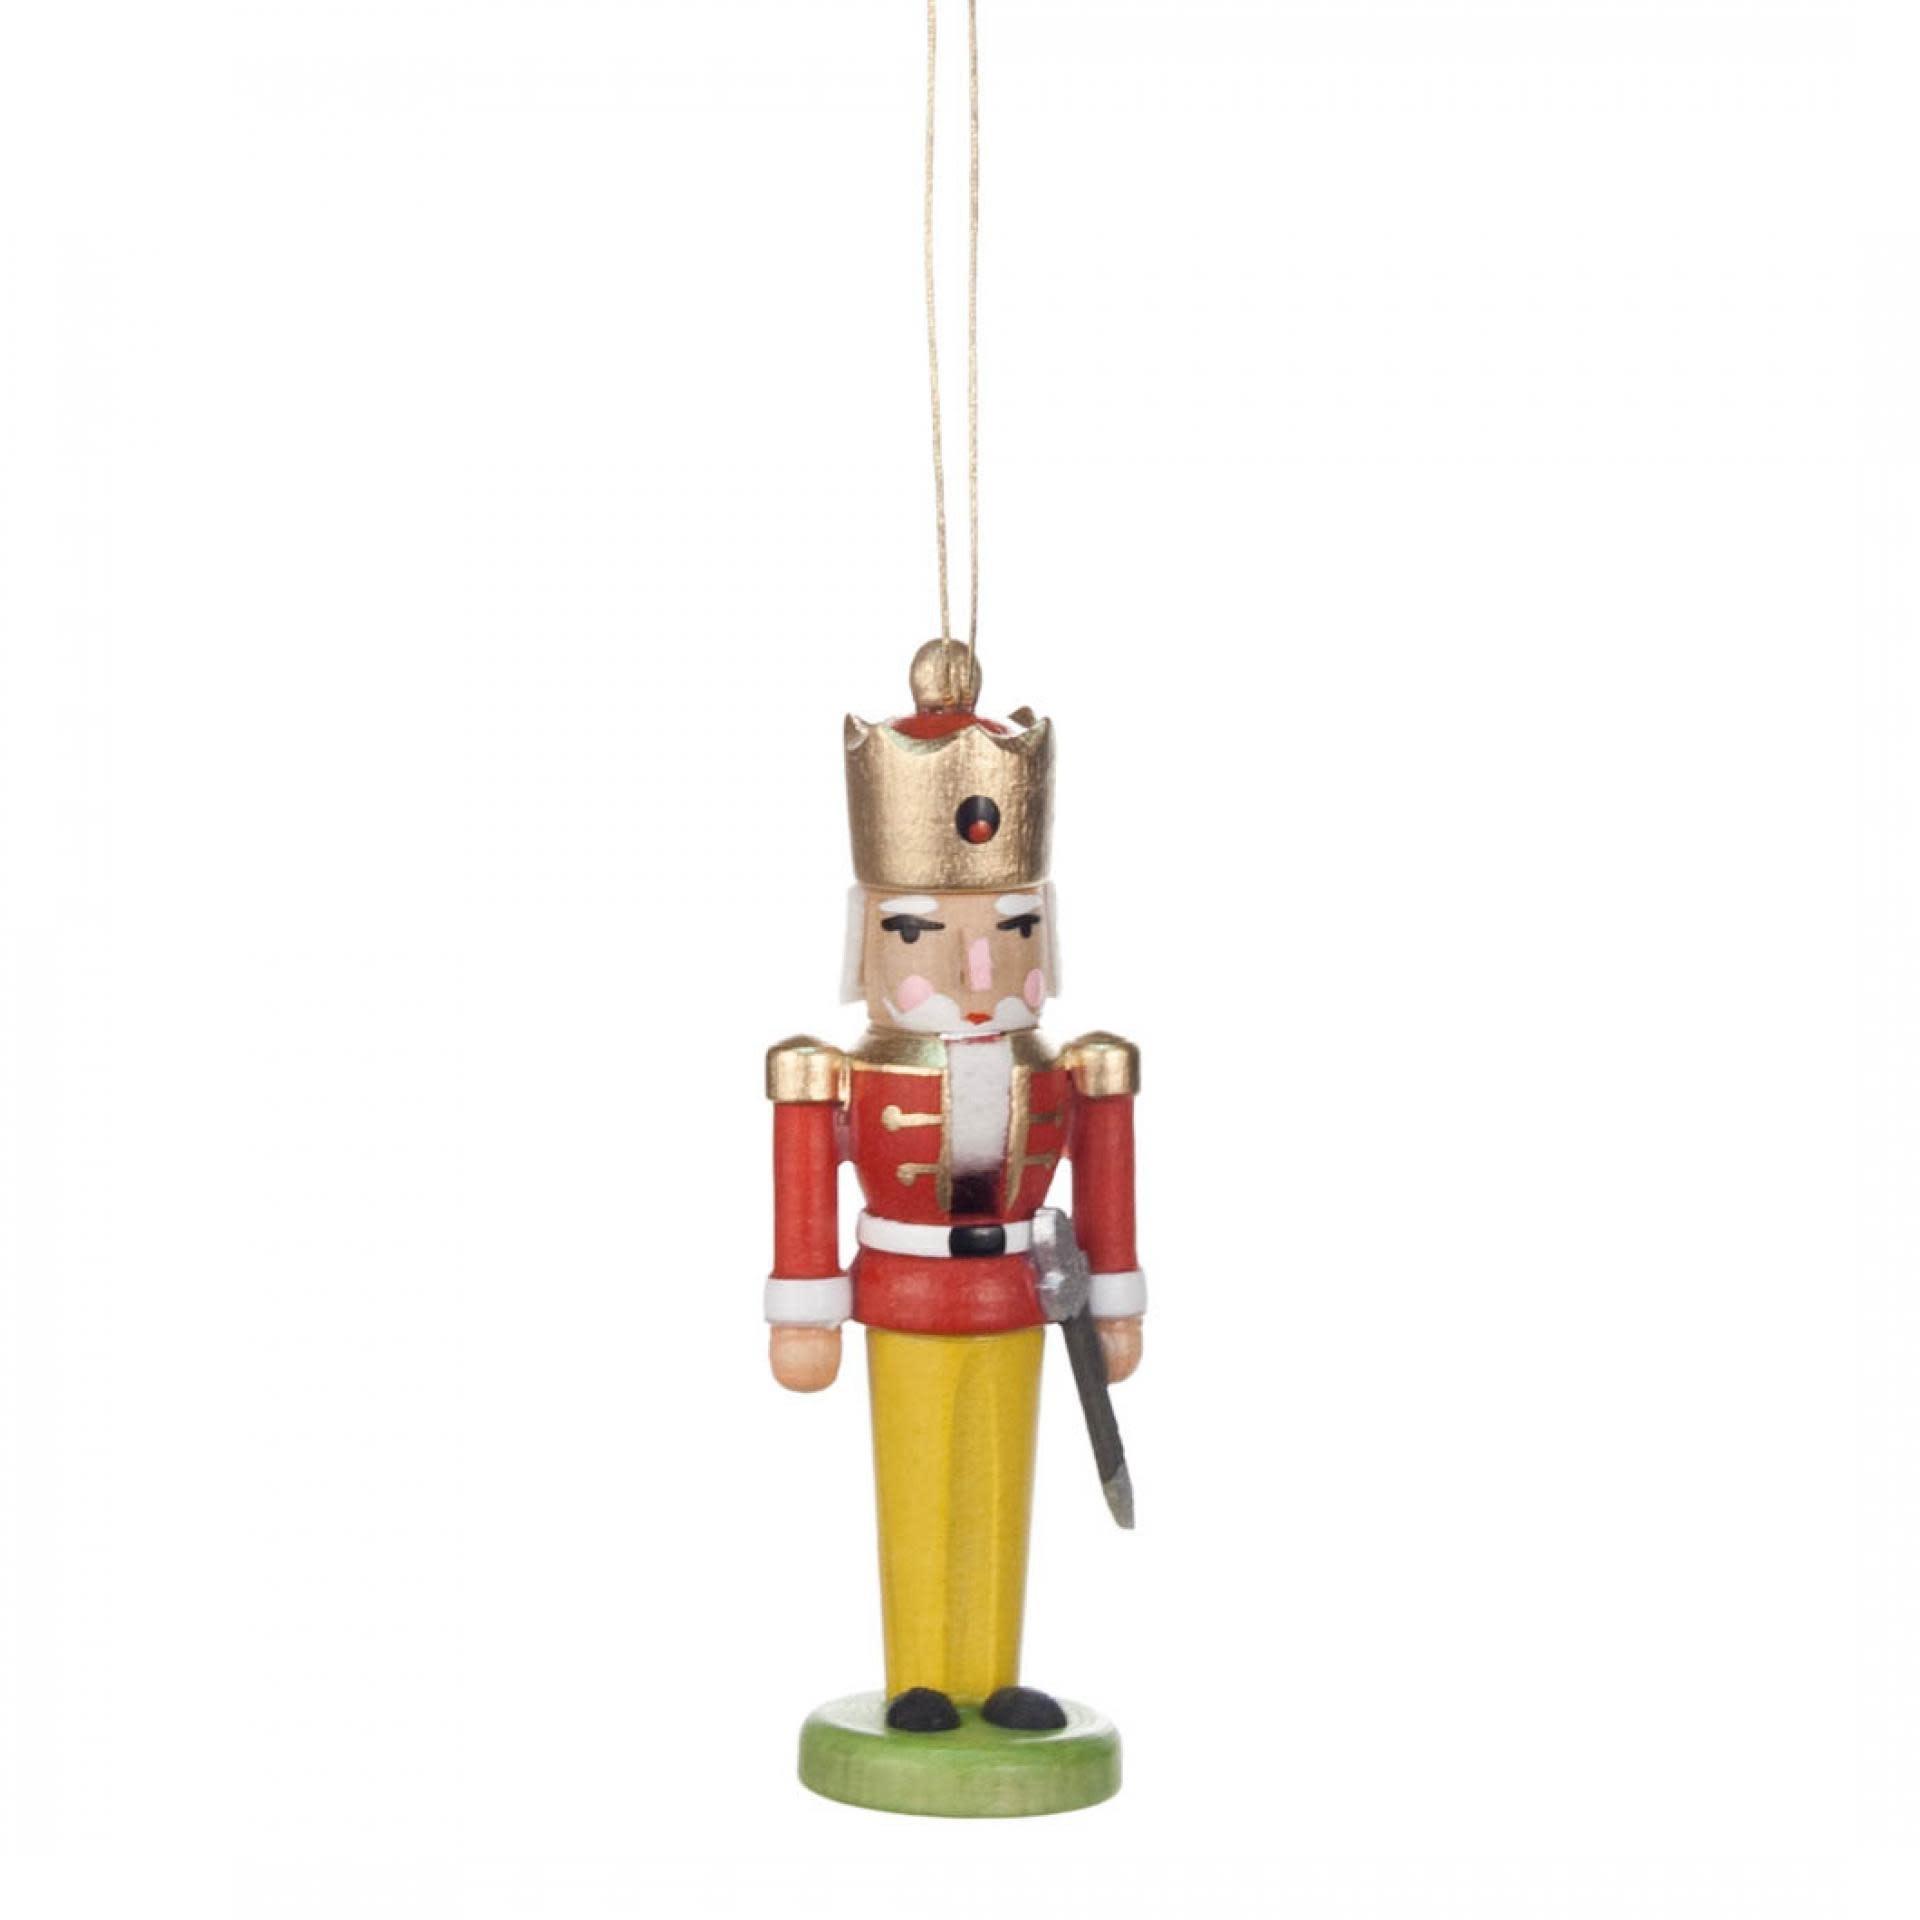 074/038F Mini Nutcracker King Red-Yellow Ornament